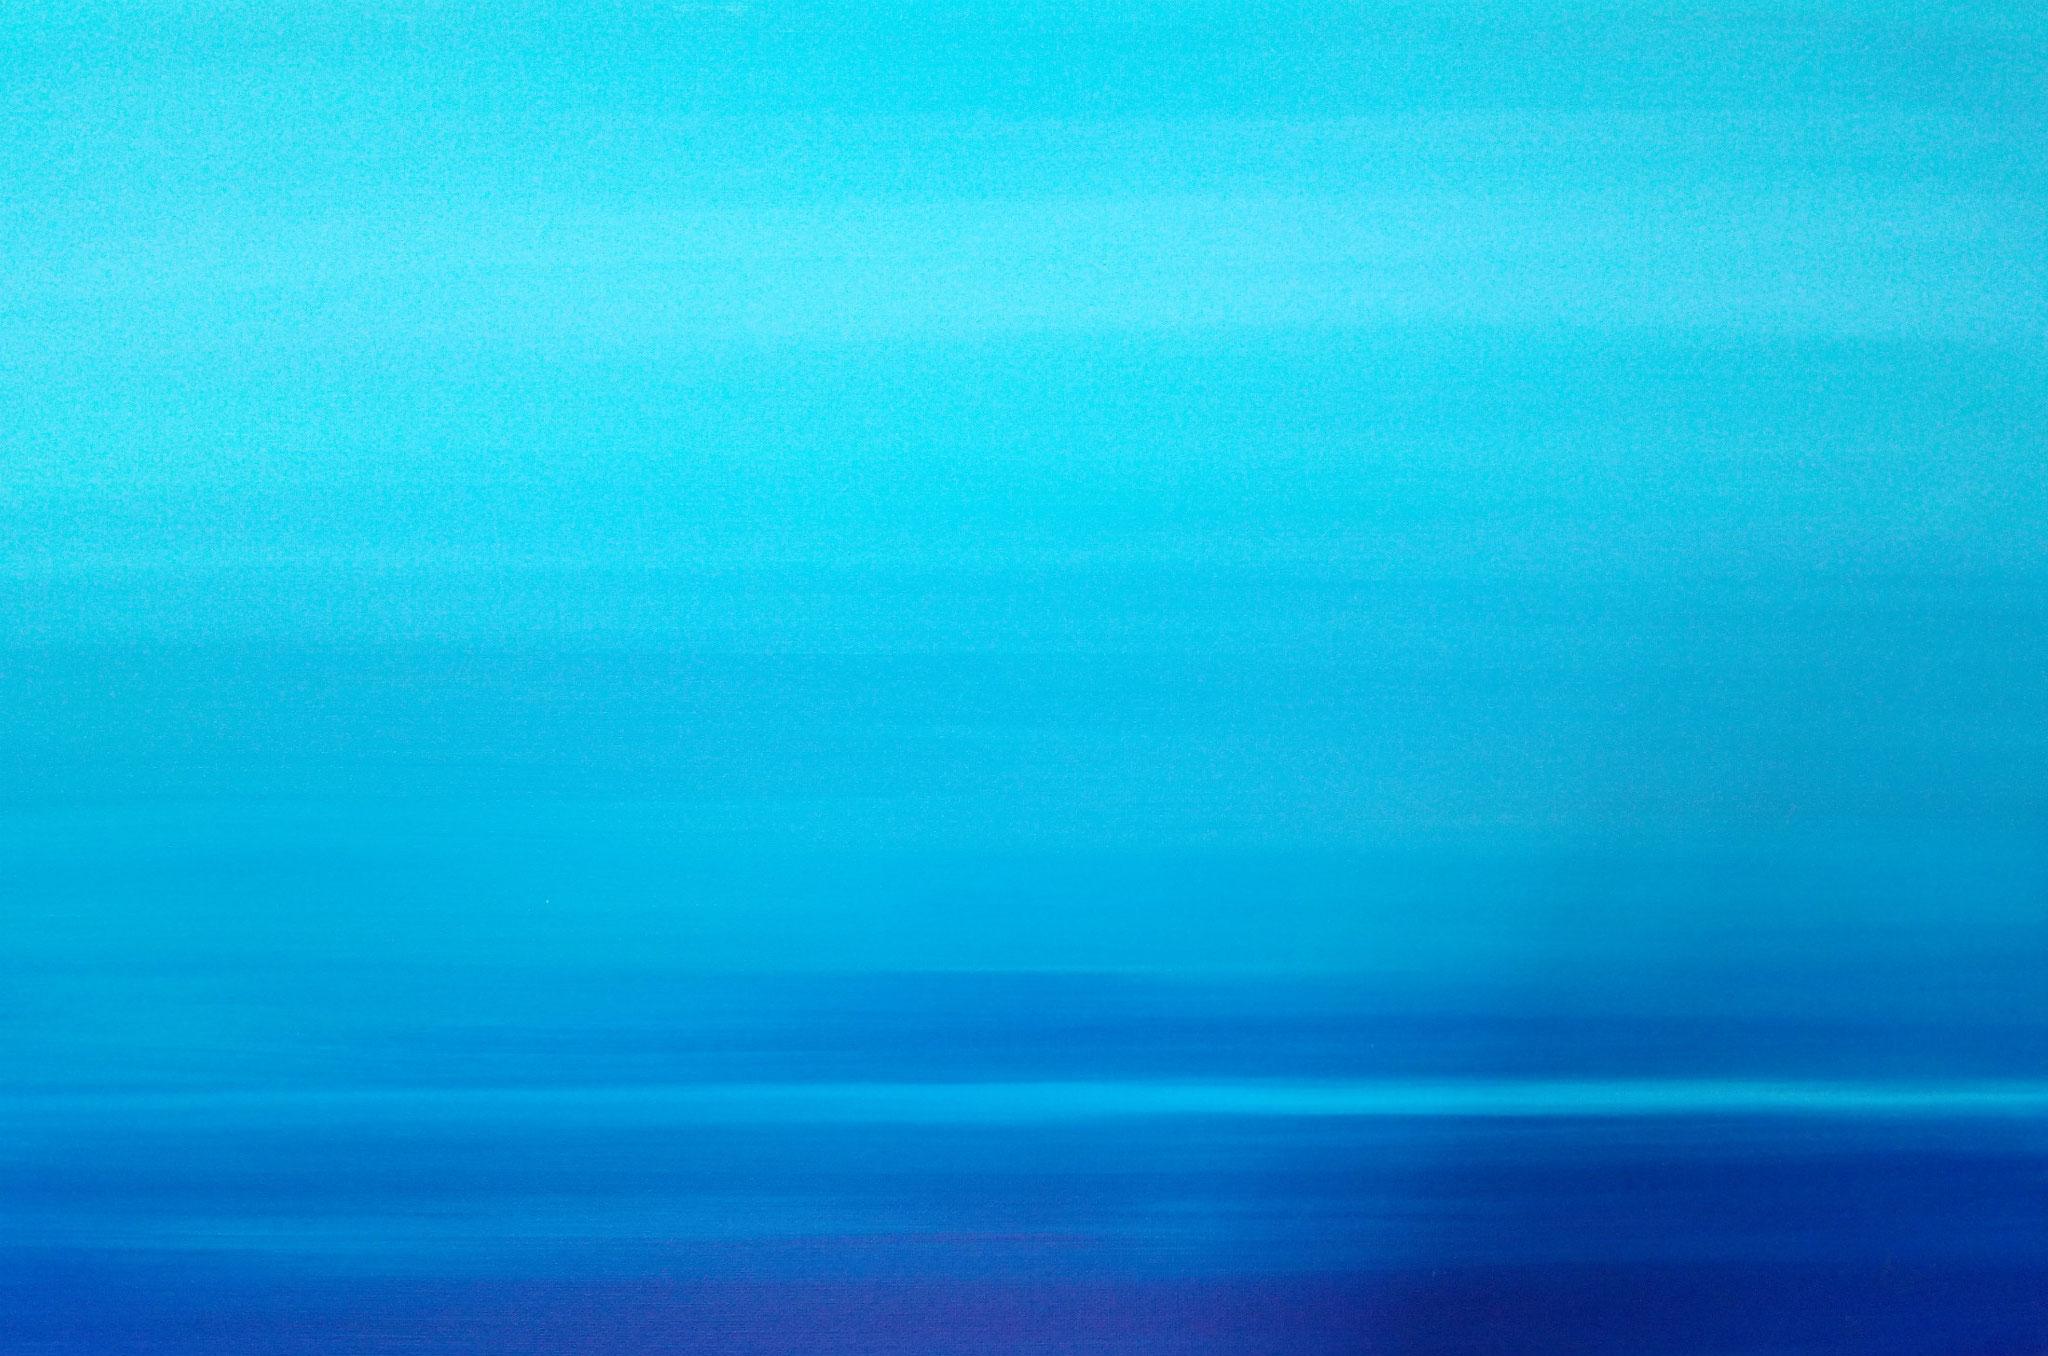 """Leben"" - Acryl auf Malpappe ohne Rahmen, 60x40 cm"